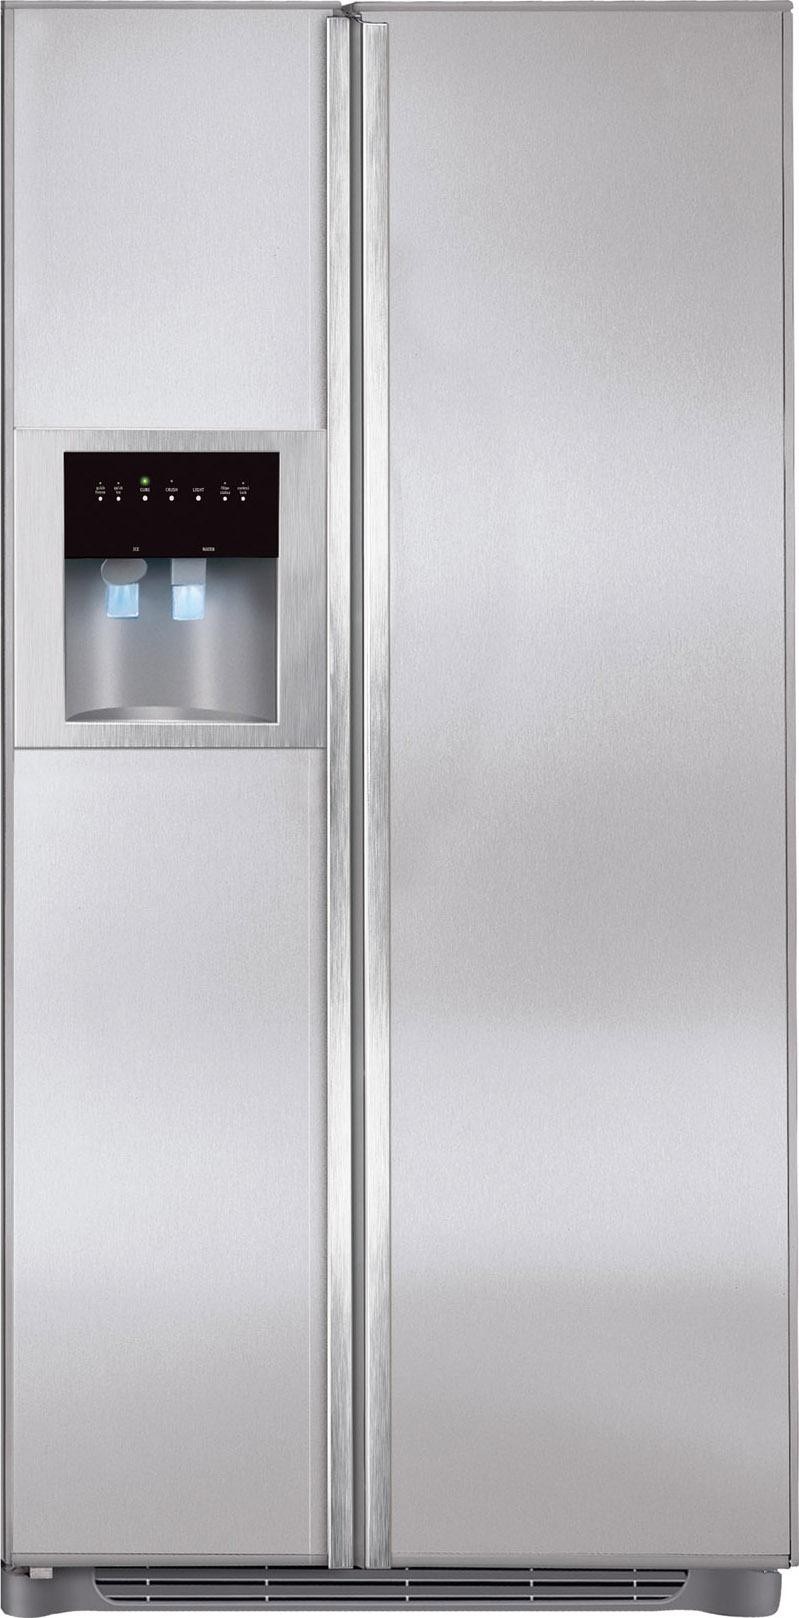 Frigidaire Refrigerator Model FGTC2349KS2 Parts